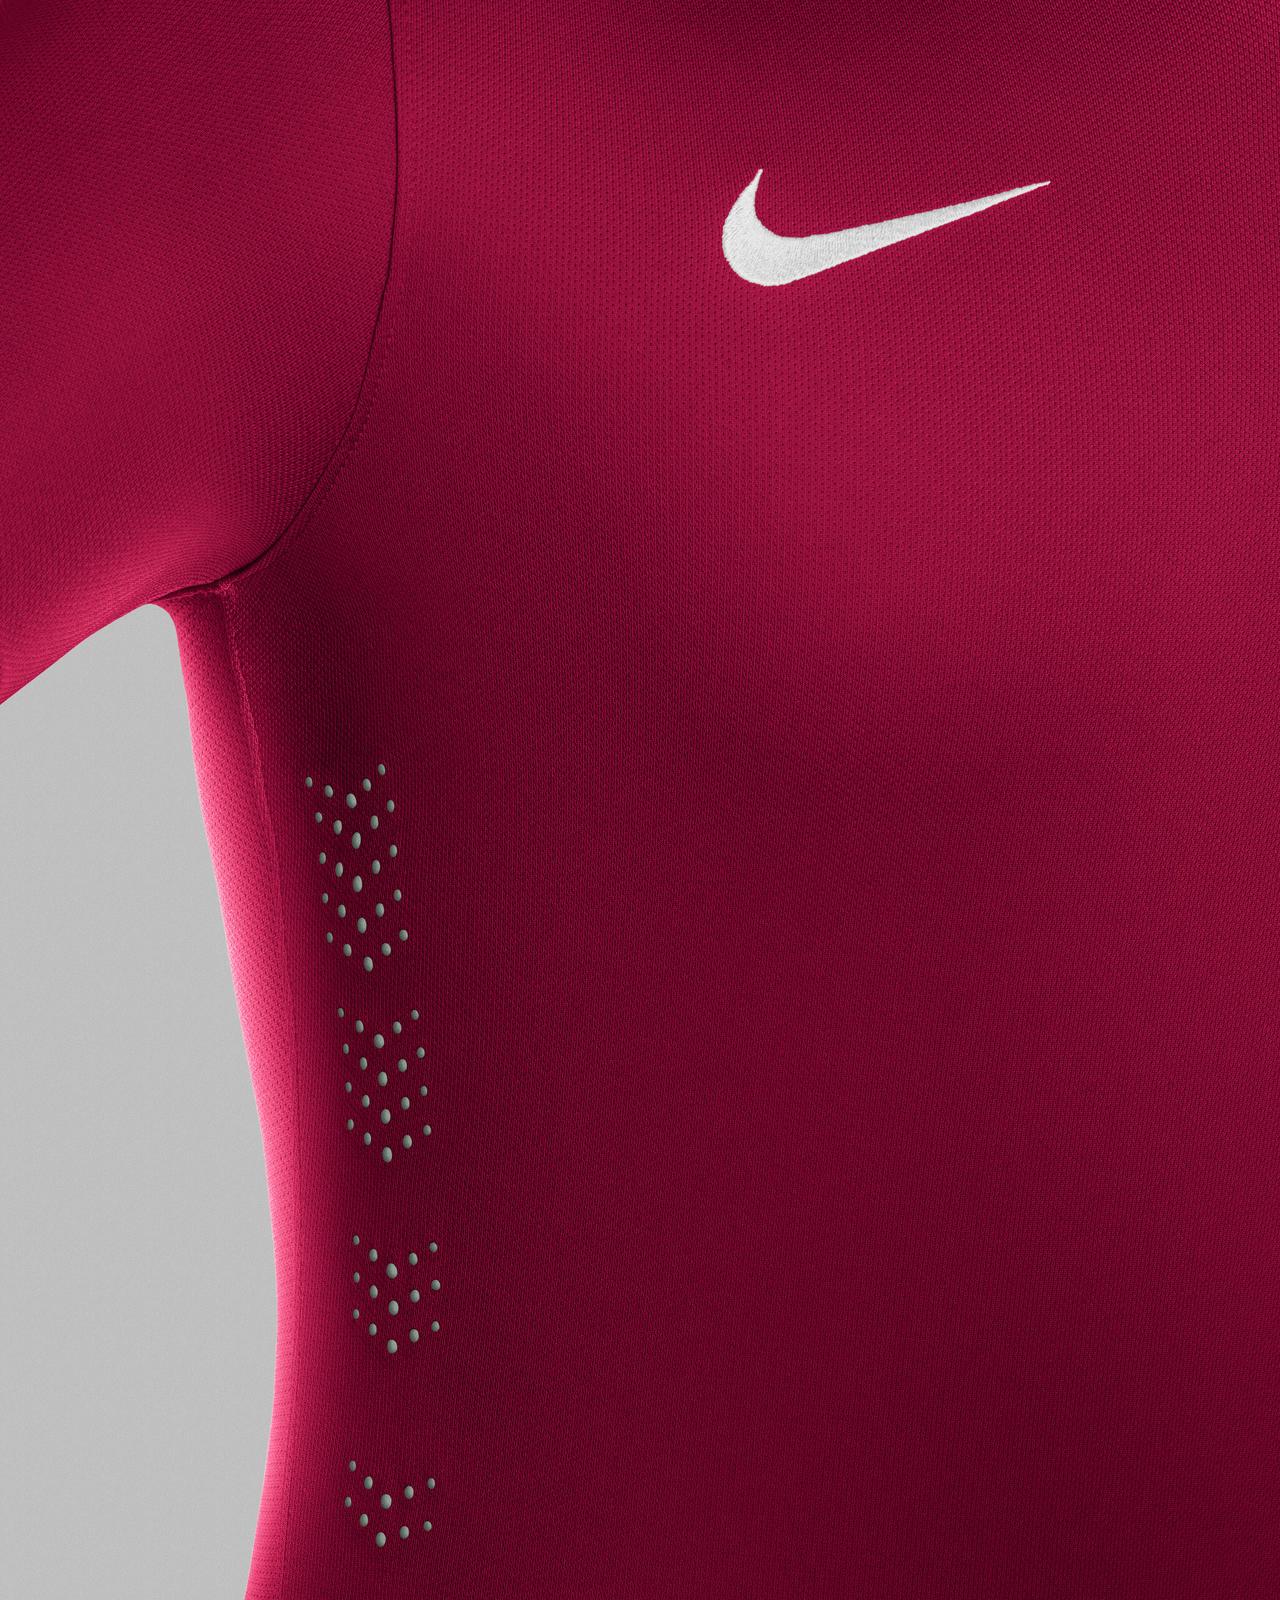 a3520cc5260 Qatar and Nike Unveil National Football Team Kits - Nike News